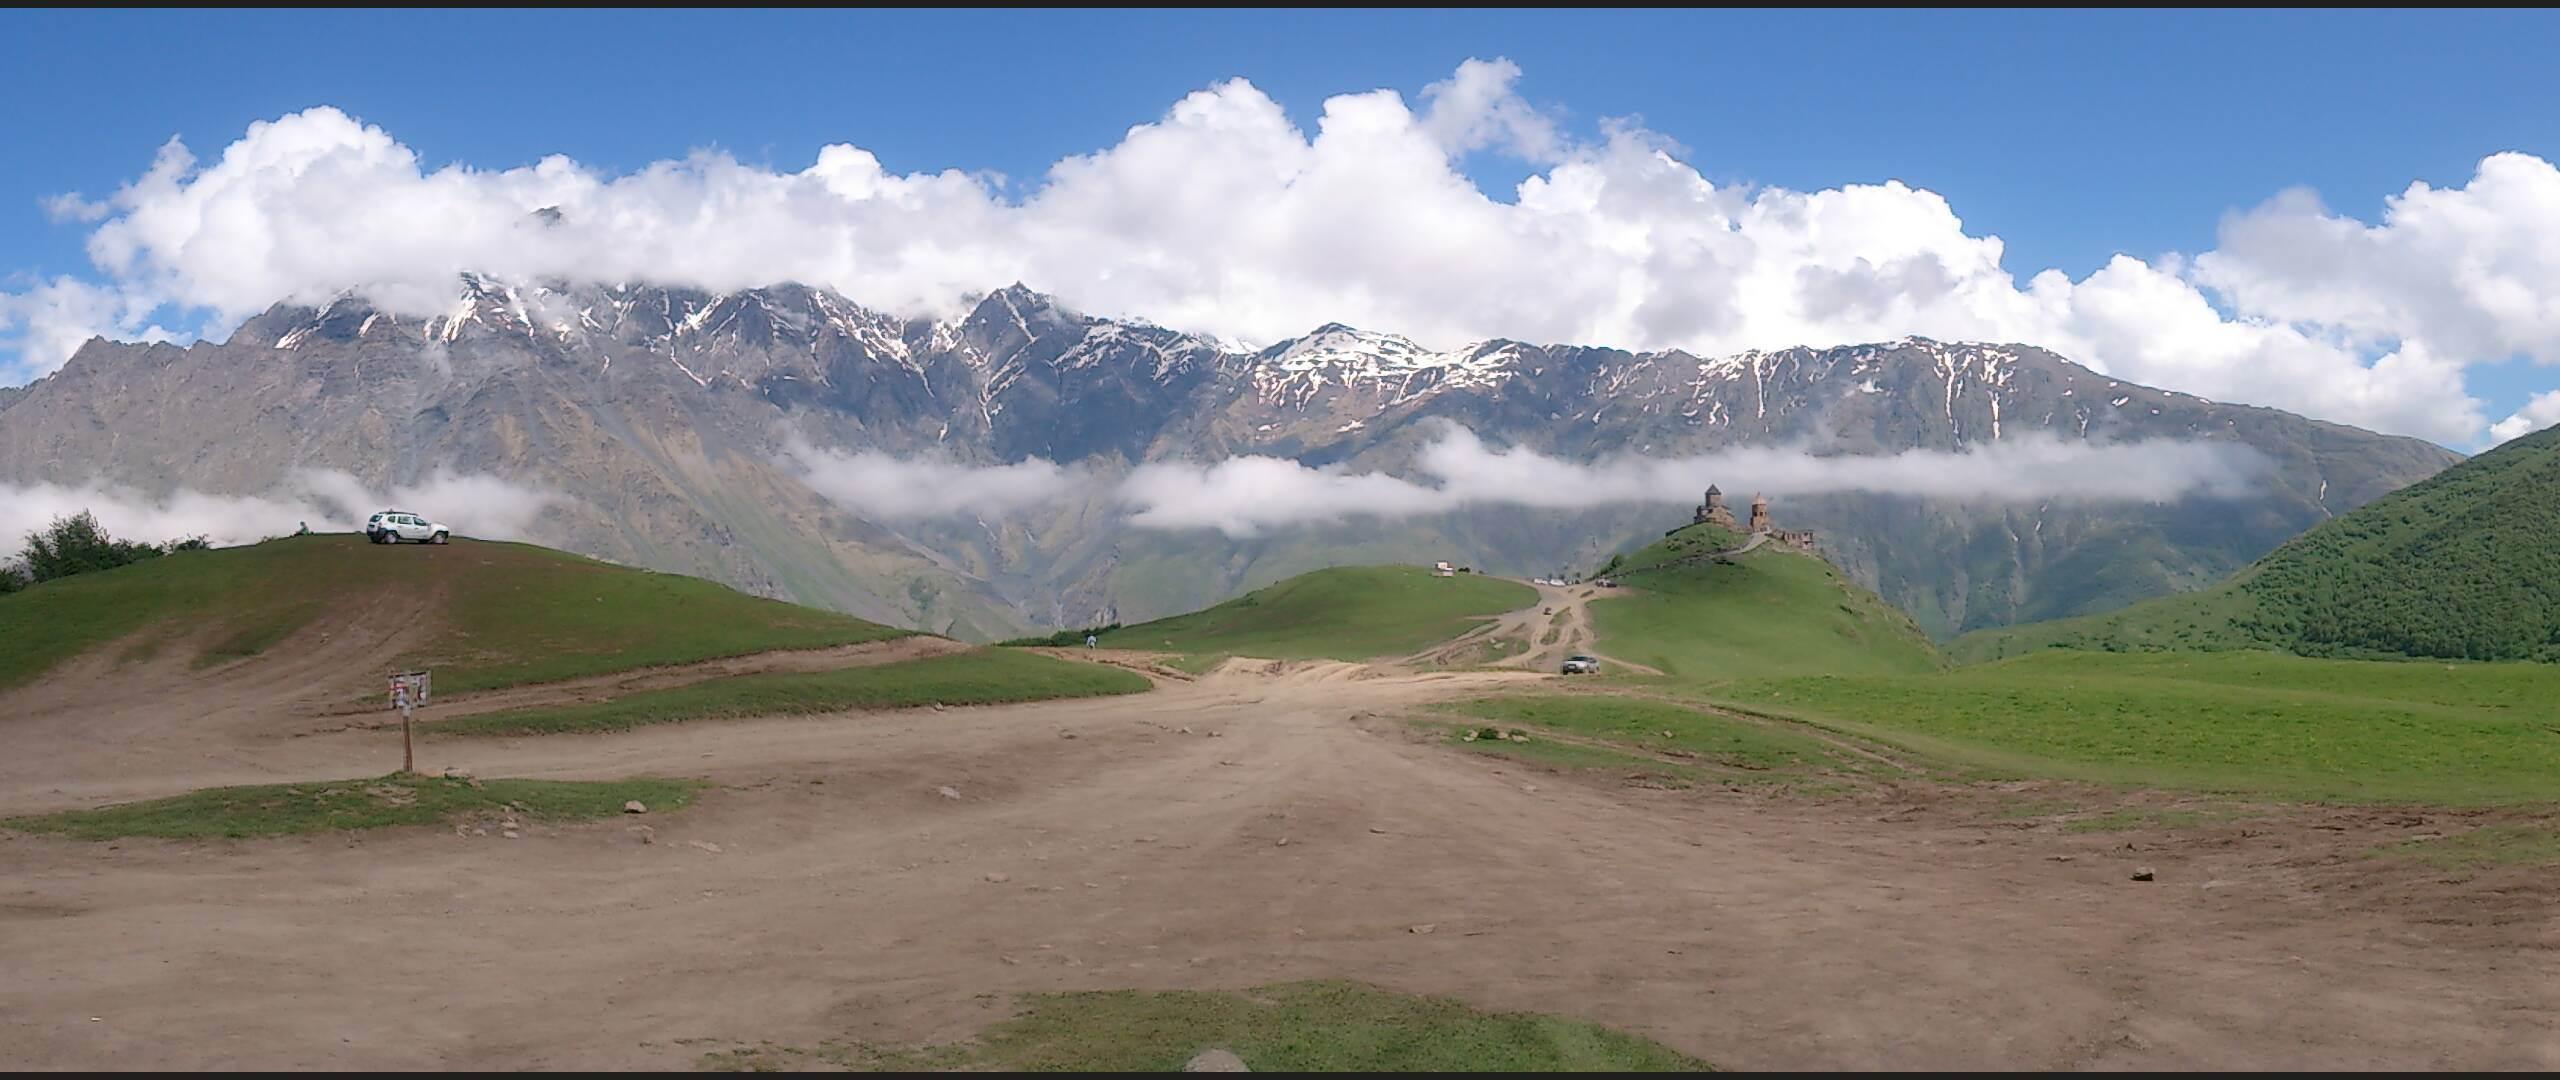 Tours and excursion in Georgia and Caucasus.